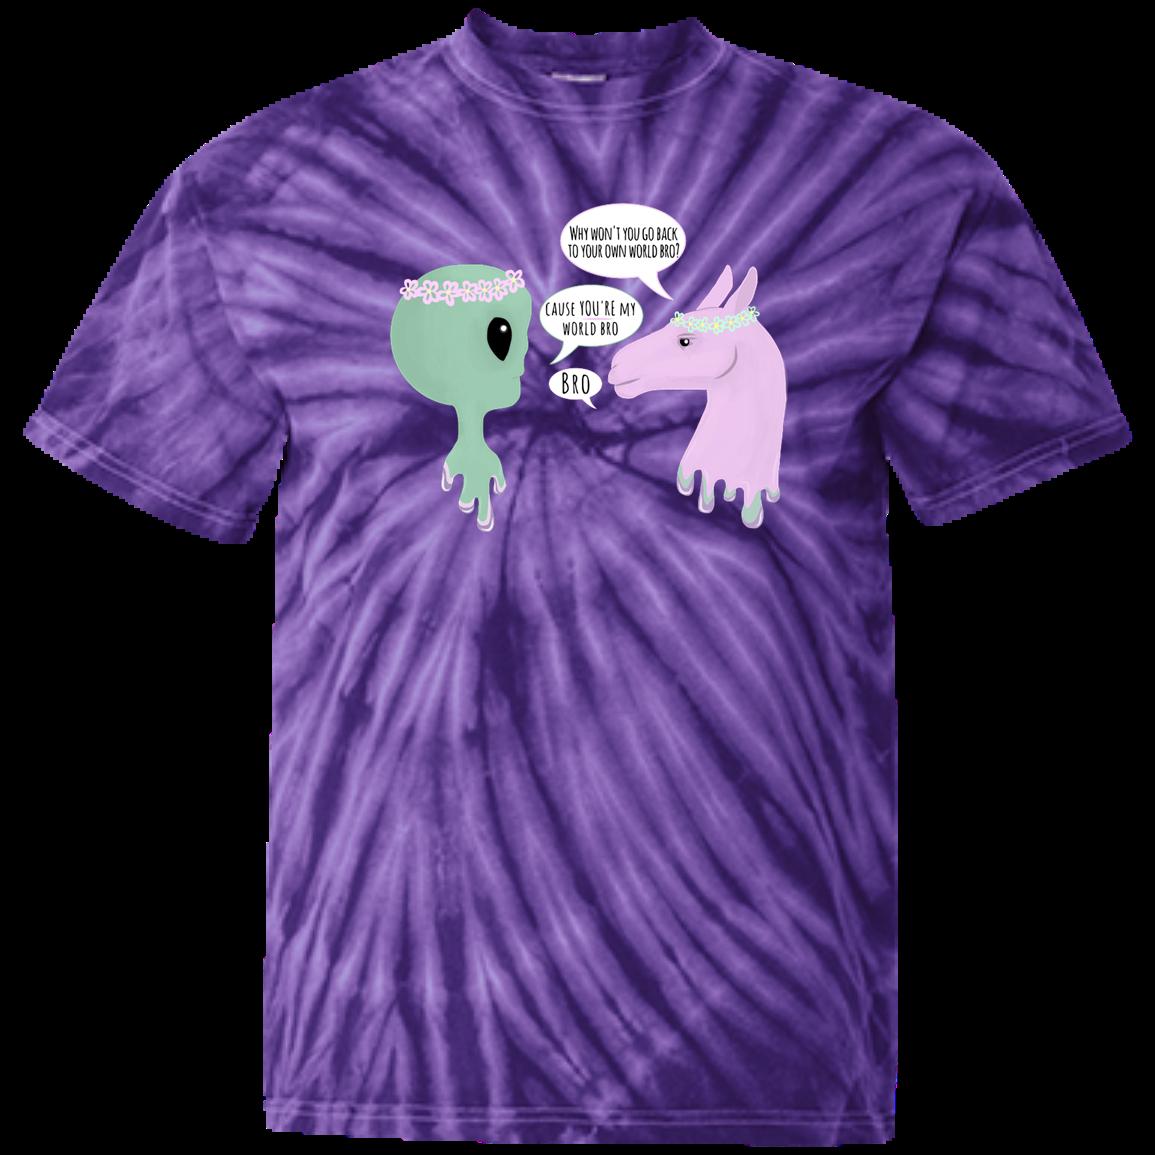 dc16c54635ca Llama and Alien Bros Youth Tie Dye T-shirt